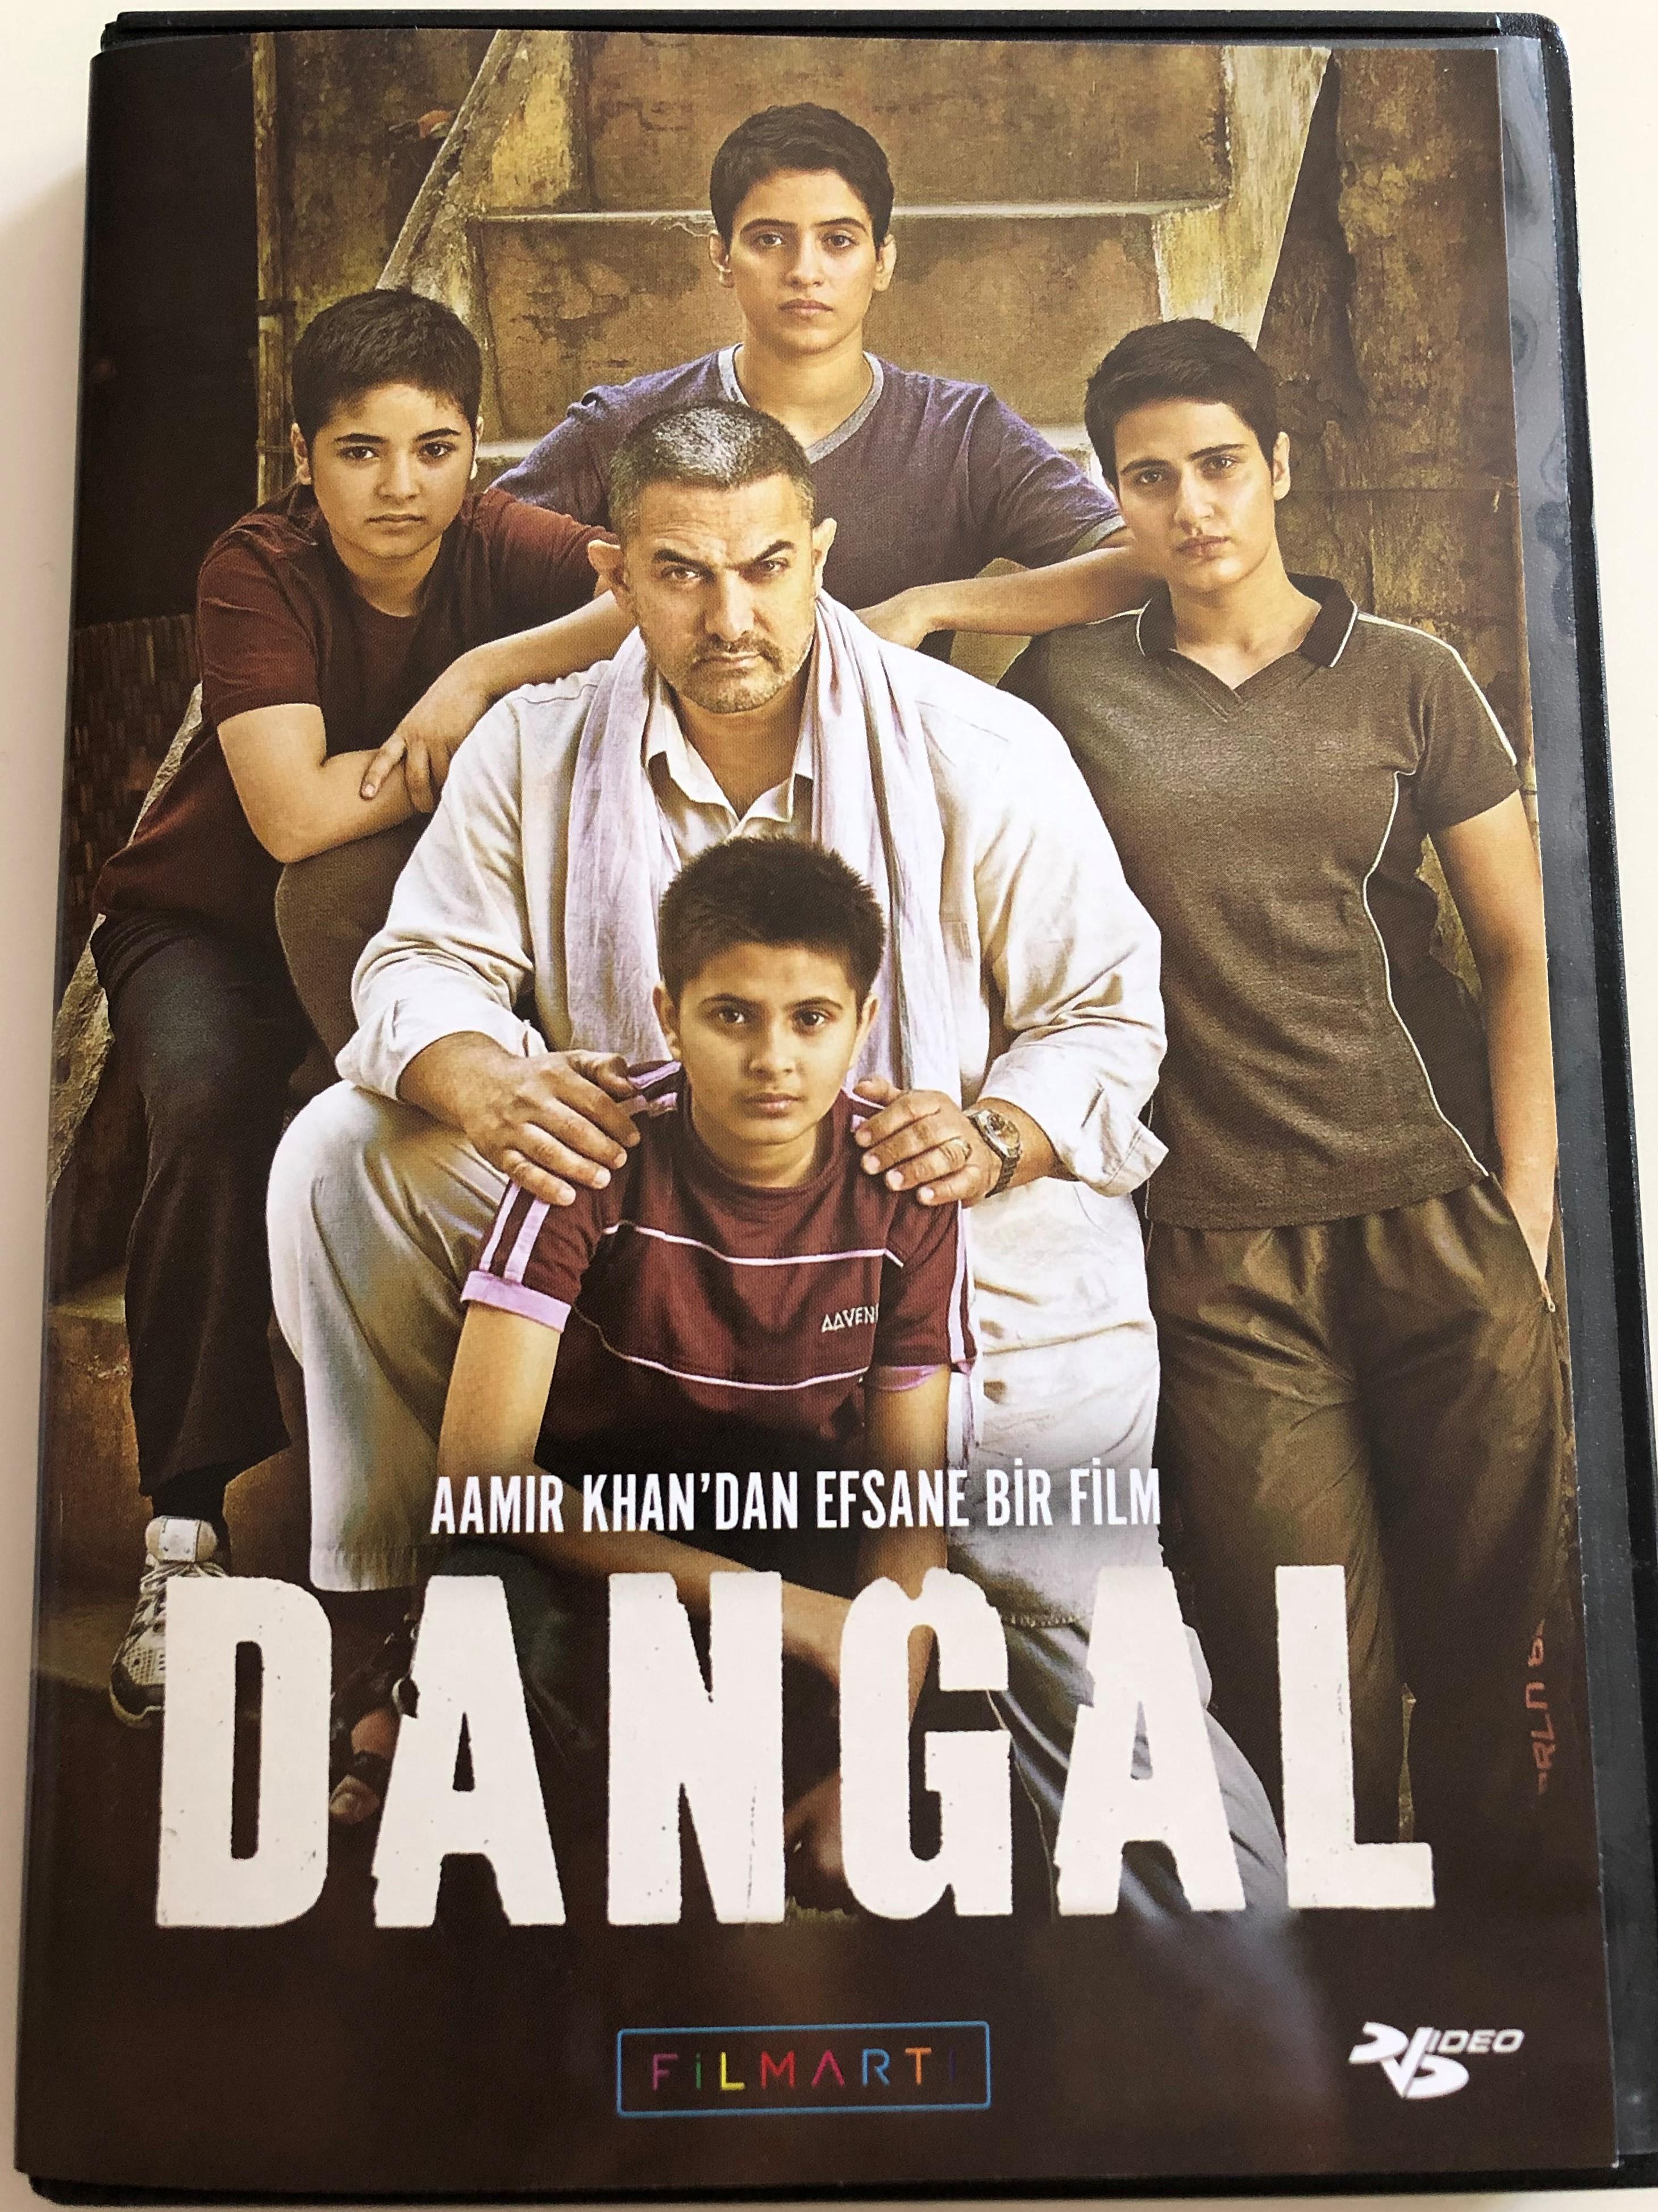 dangal-dvd-2016-wrestling-competition-directed-by-nitesh-tiwari-starring-aamir-khan-sakshi-tanwar-fatima-sana-shaikh-zaira-wasim-sanya-malhotra-suhani-bhatnagar-aparshakti-khurana-girish-kulkarni-1-.jpg